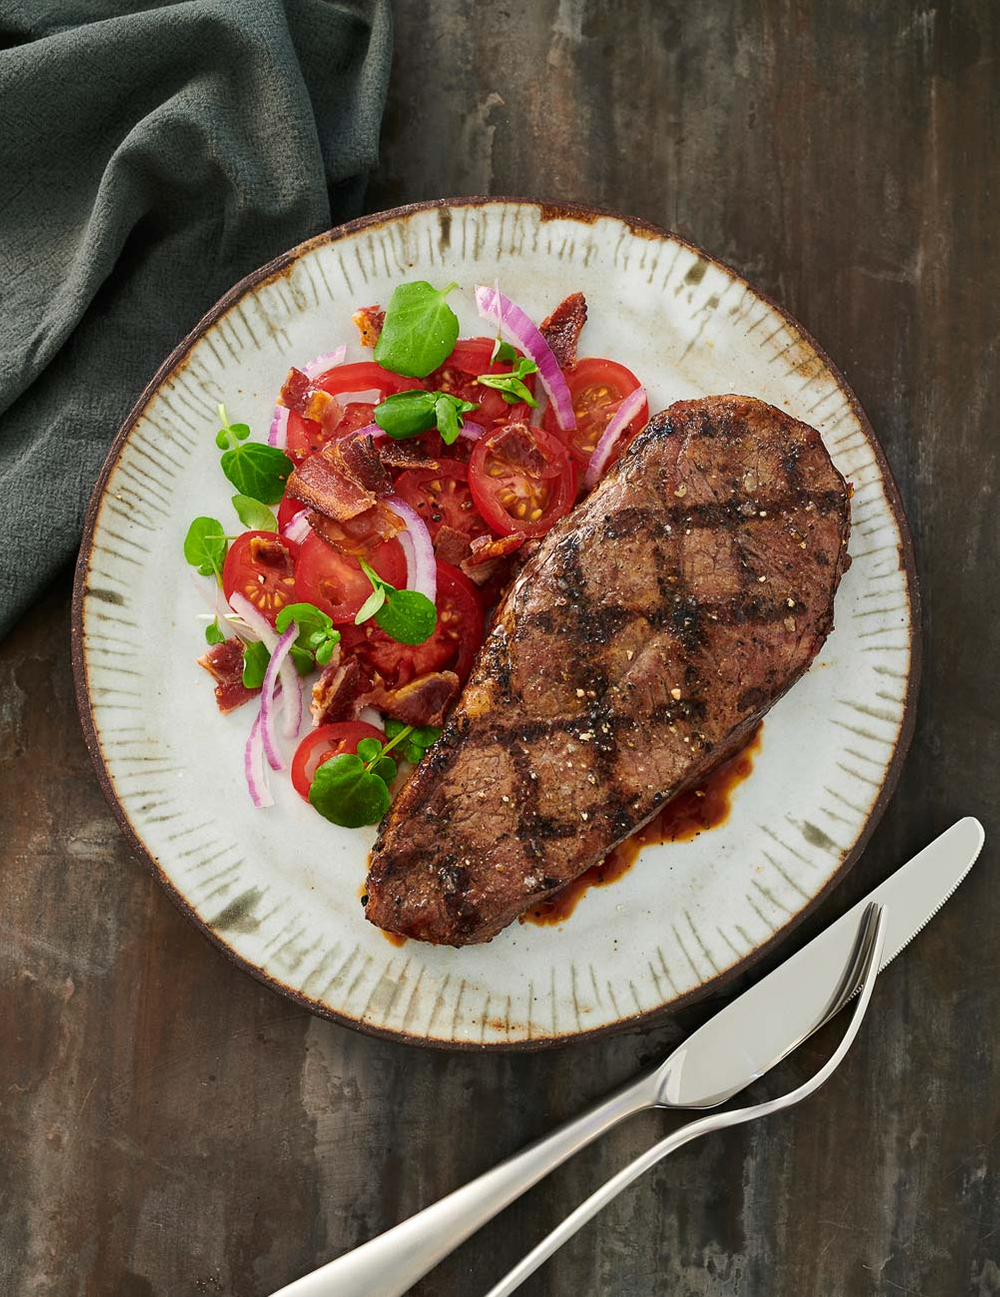 Cinnamon-Spiced-Steak-food-stylist-san-francisco.jpg